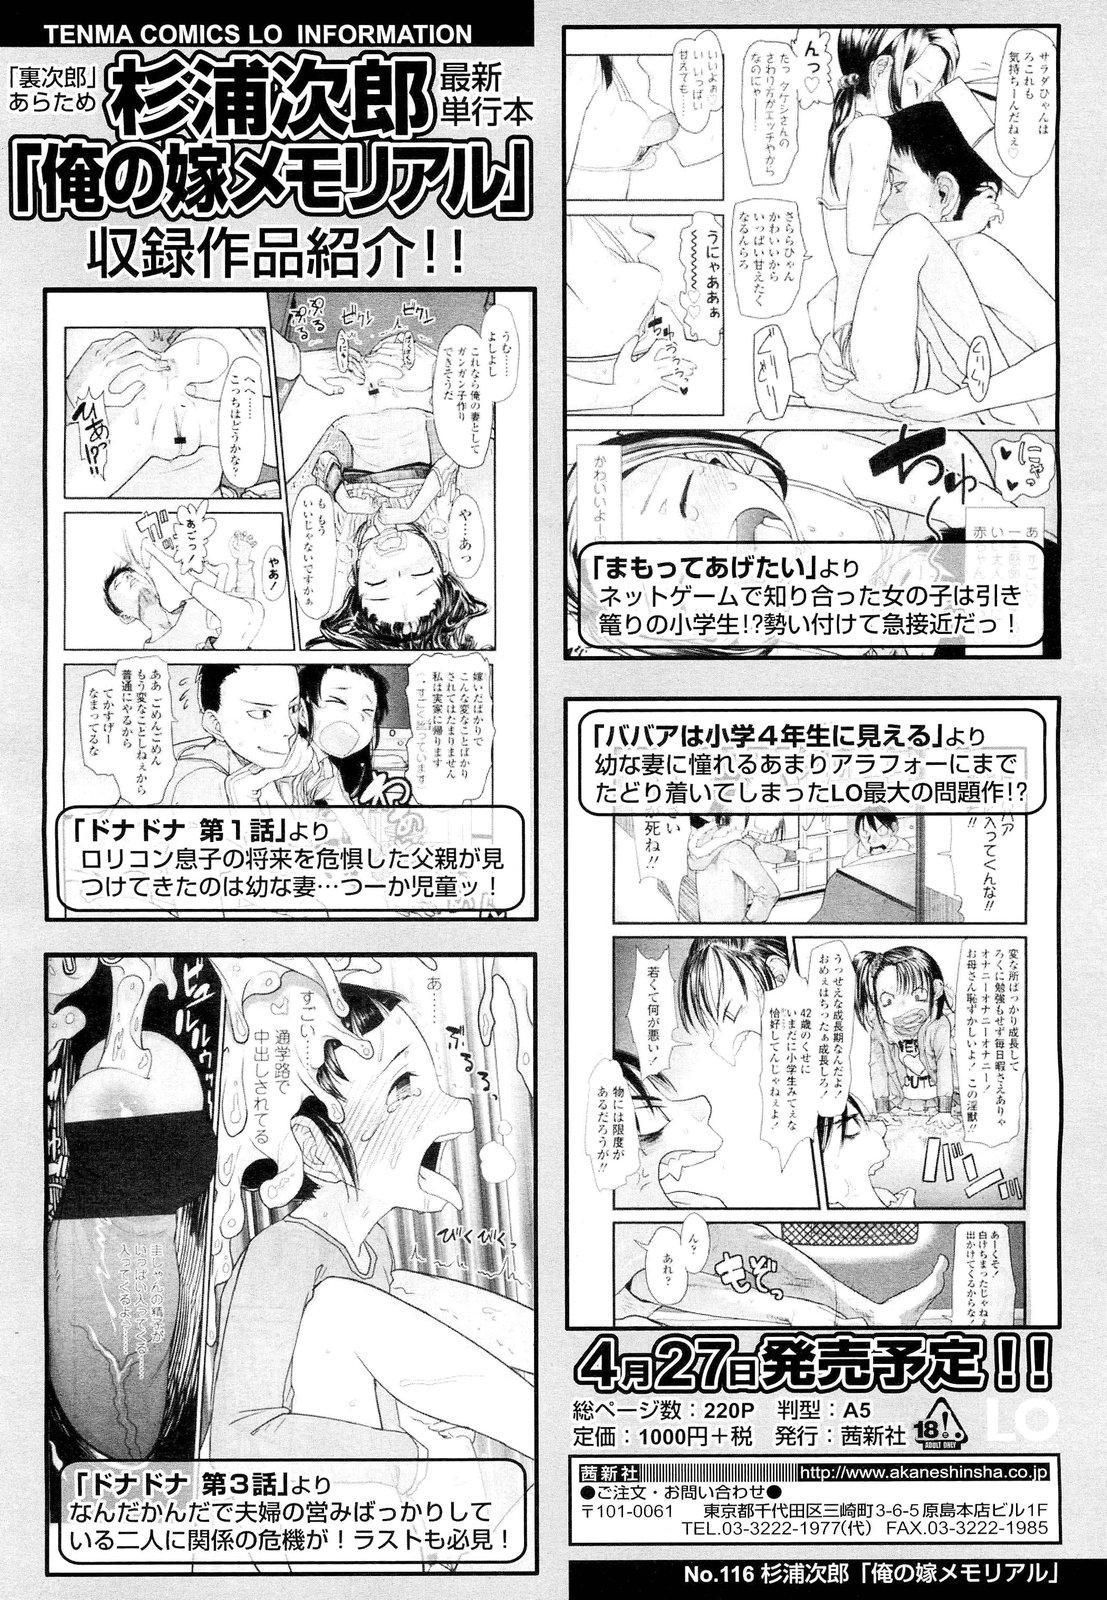 COMIC LO 2012-05 Vol. 98 437